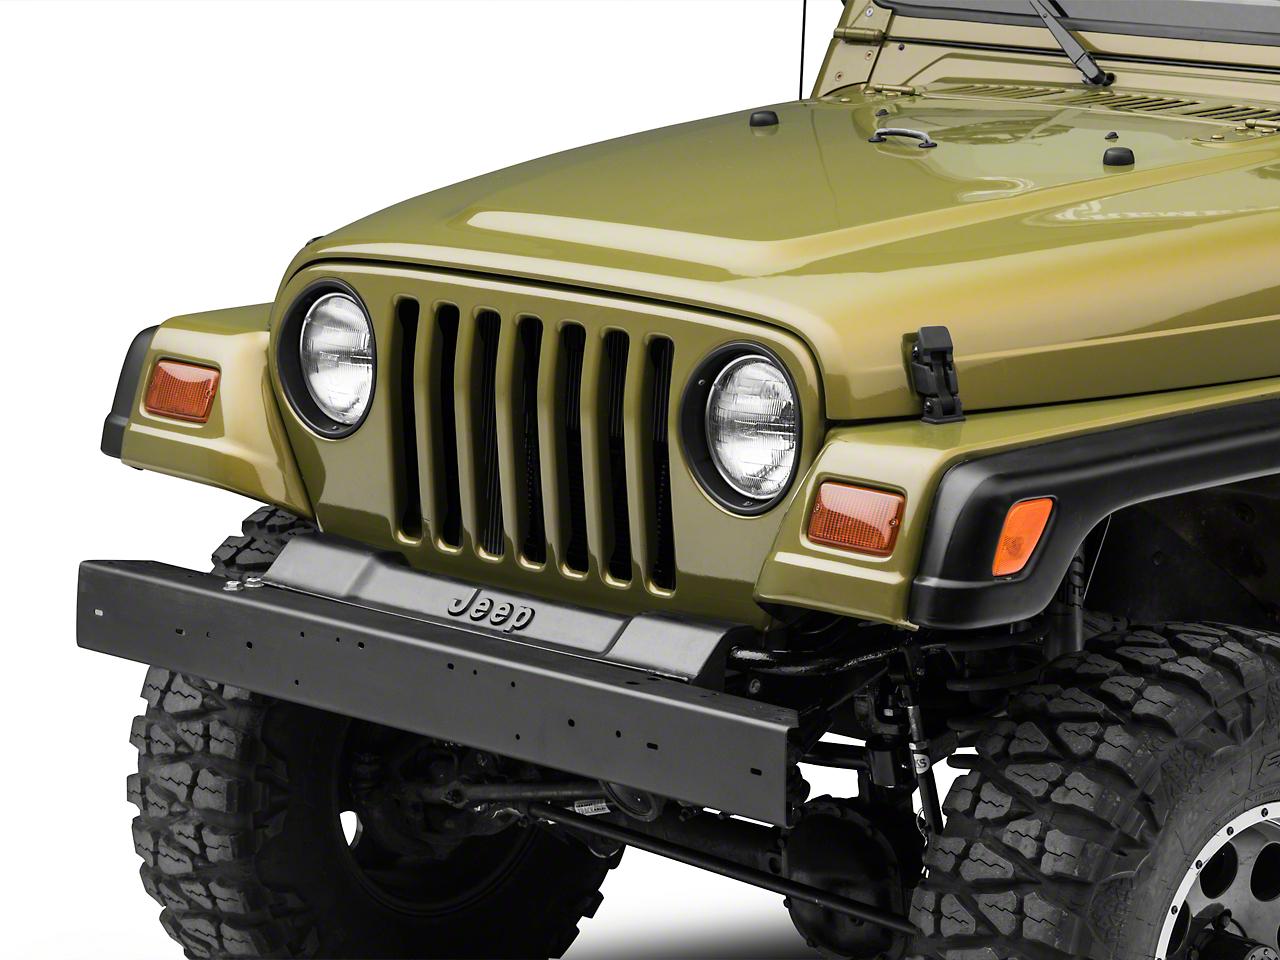 Front Bumper - Black (97-06 Jeep Wrangler TJ)